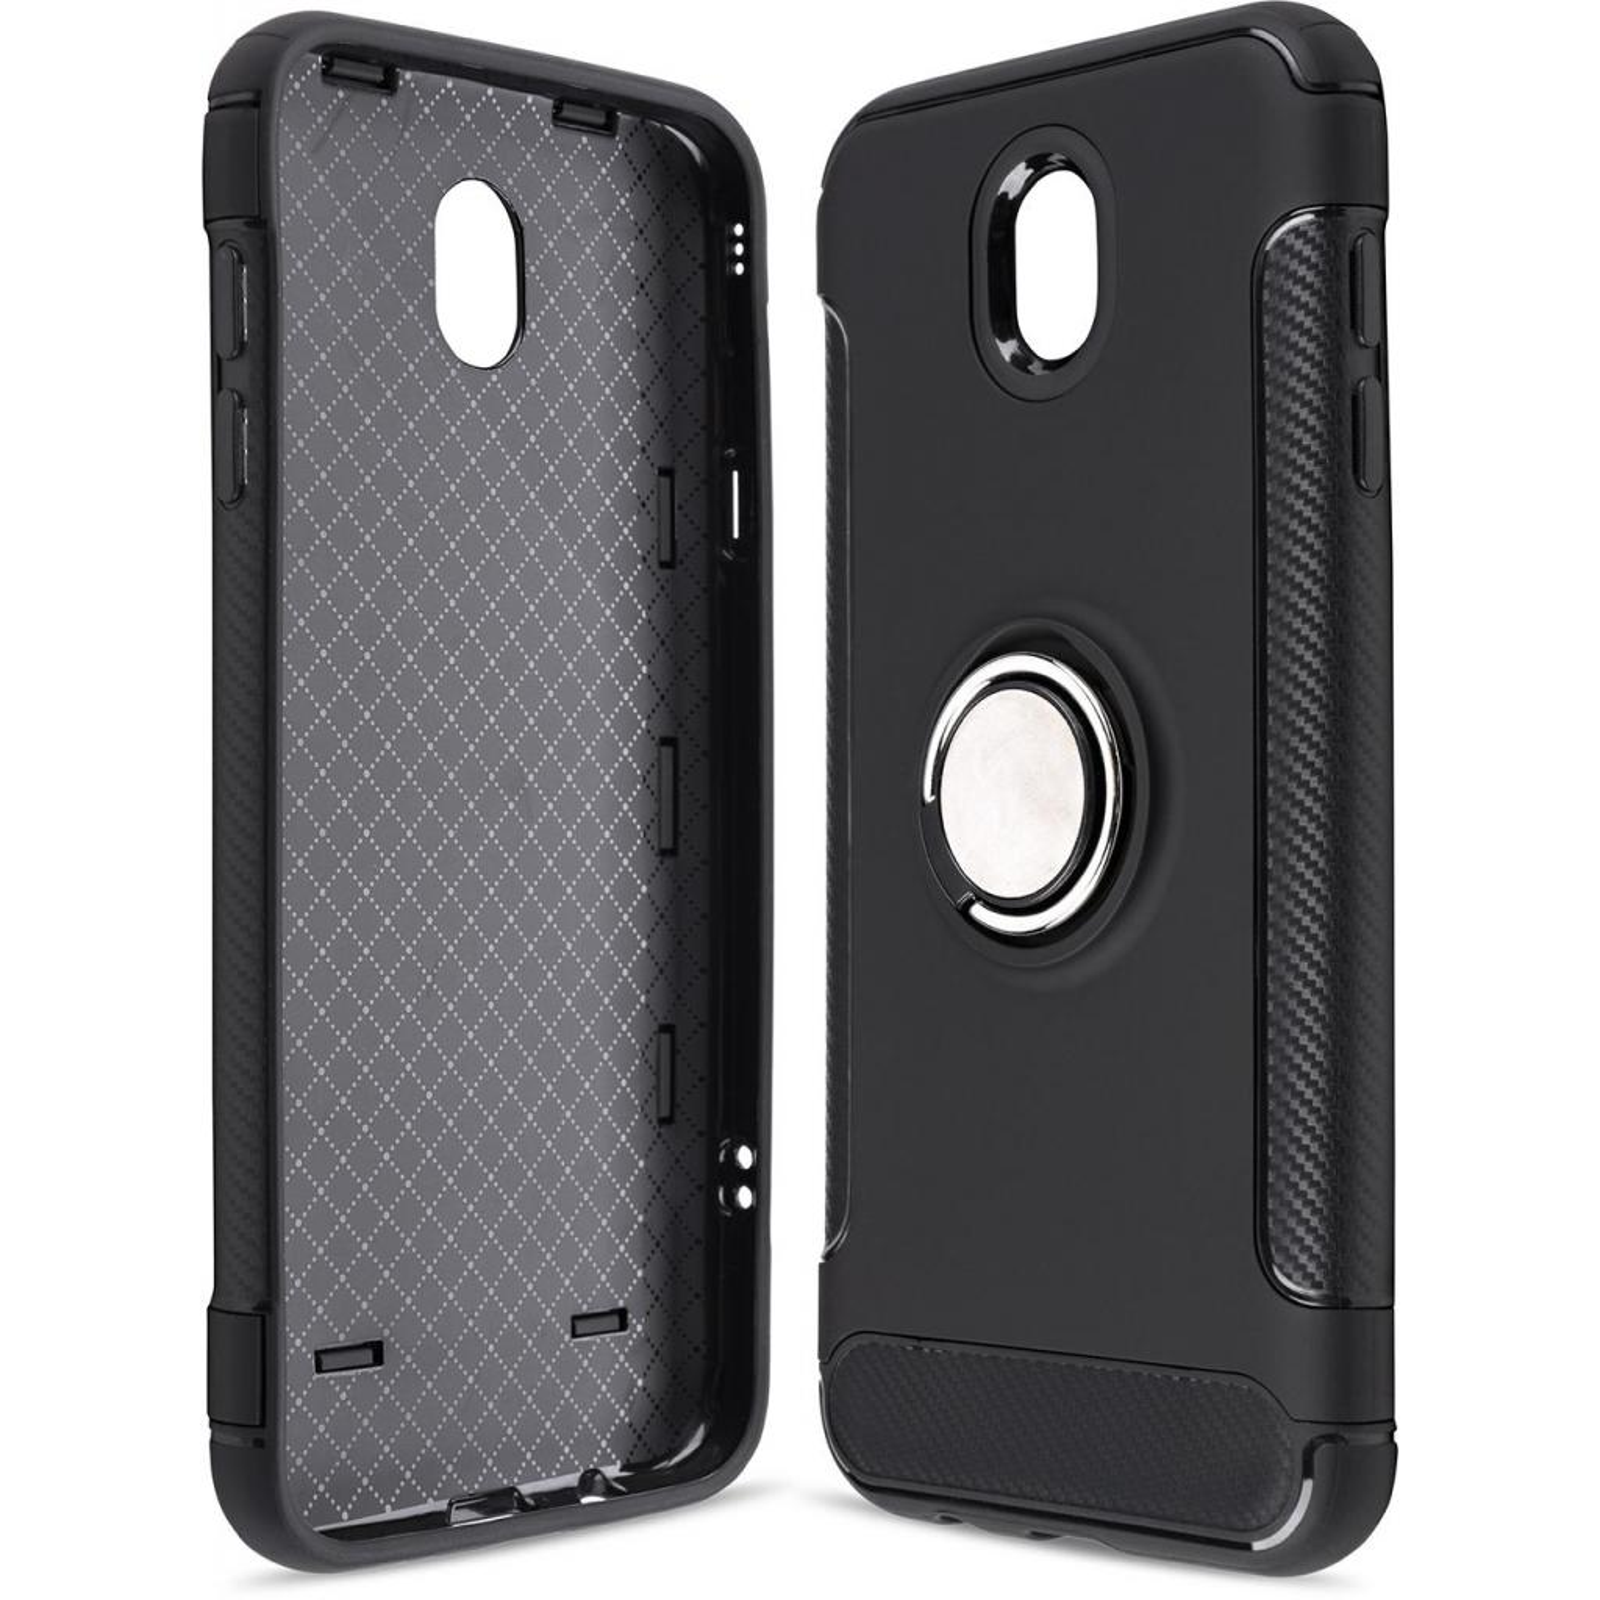 Чехол для моб. телефона Laudtec для Samsung J7 2017/J730 Ring stand (black) (LR-J730-BC)